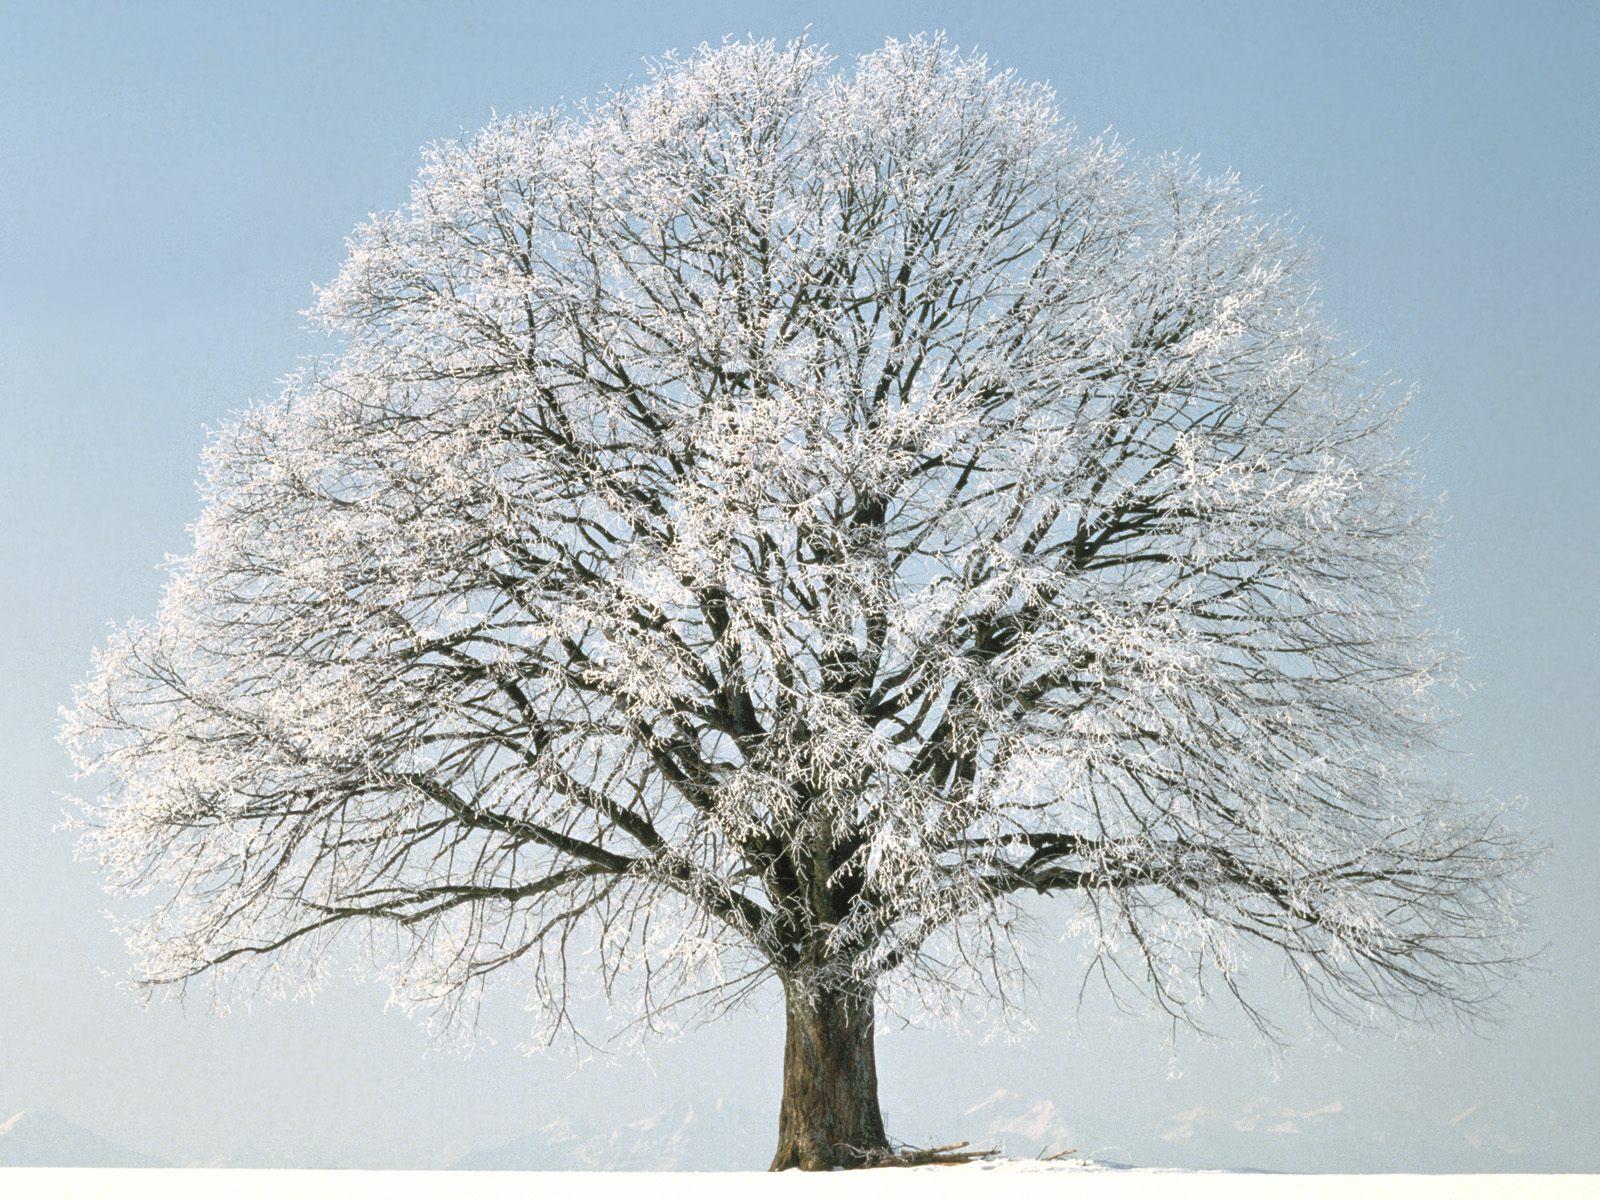 https://1.bp.blogspot.com/-tdCW4V1CnWM/TamPXoplC_I/AAAAAAAACqY/AV45AvZTsF0/s1600/winter+scenes+1+%25288%2529.jpg